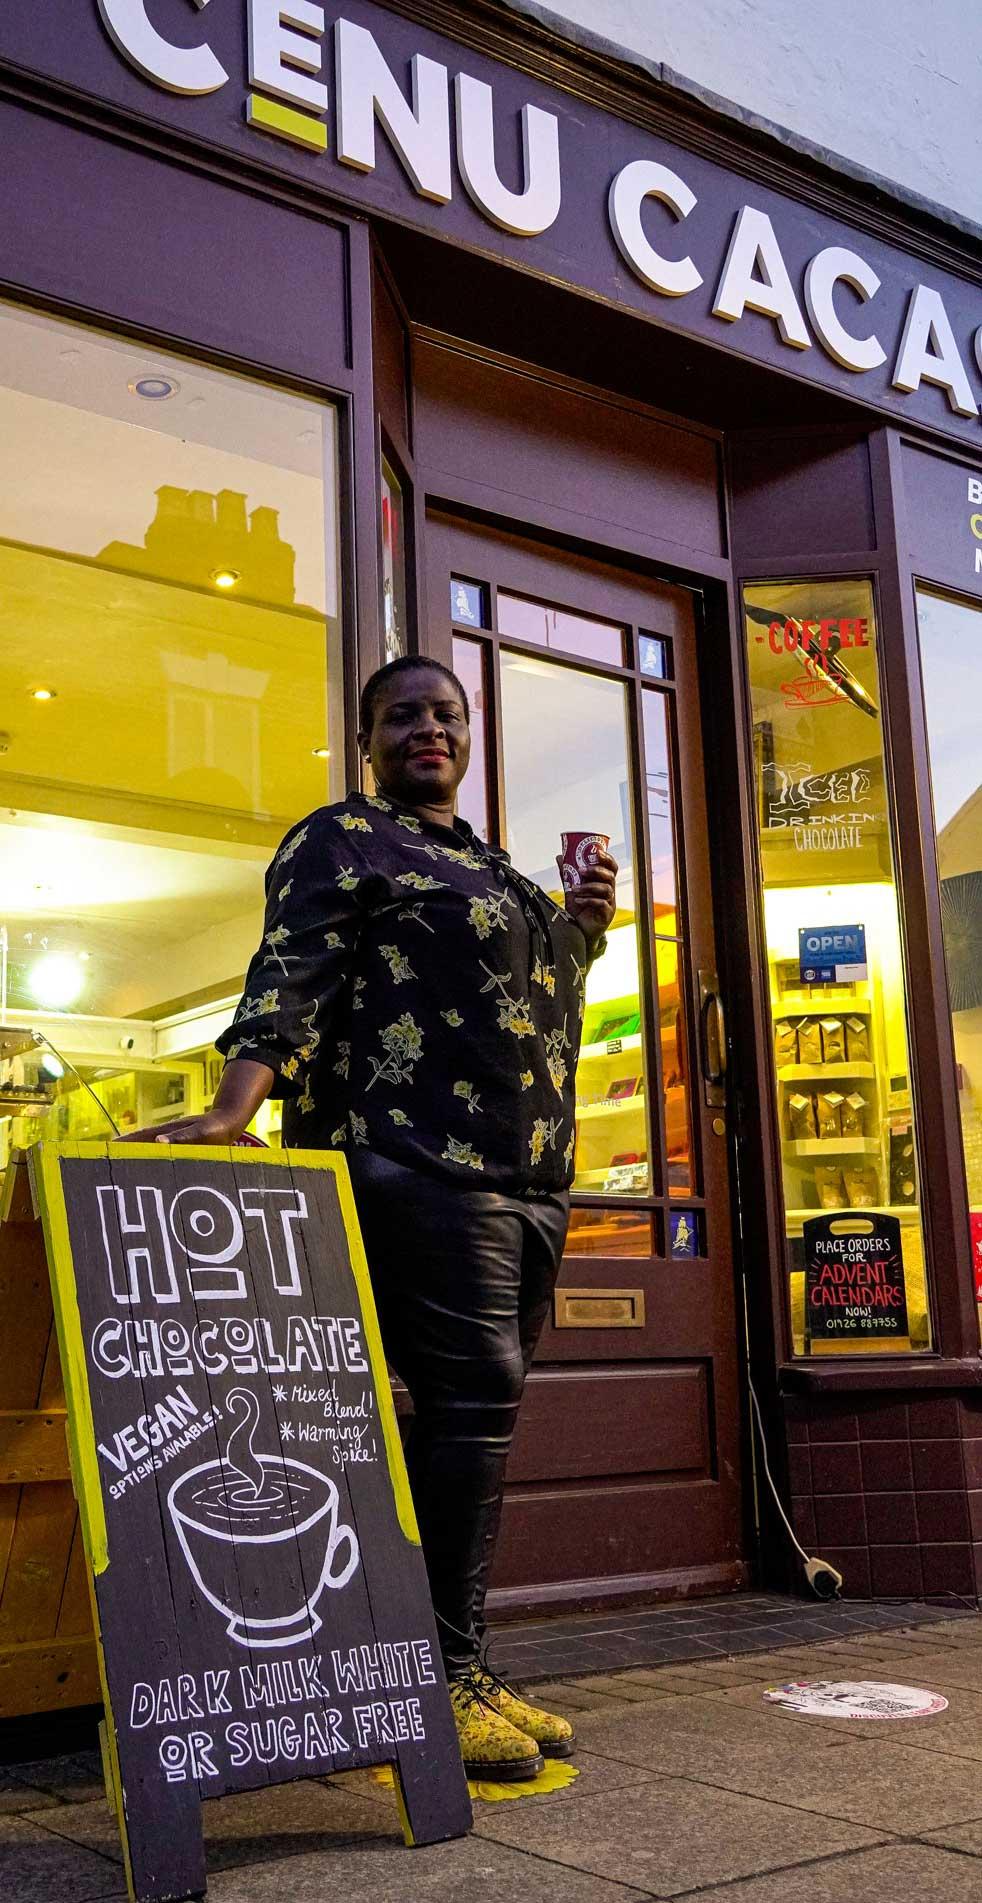 Cenu Cacao Shop- Rosemary